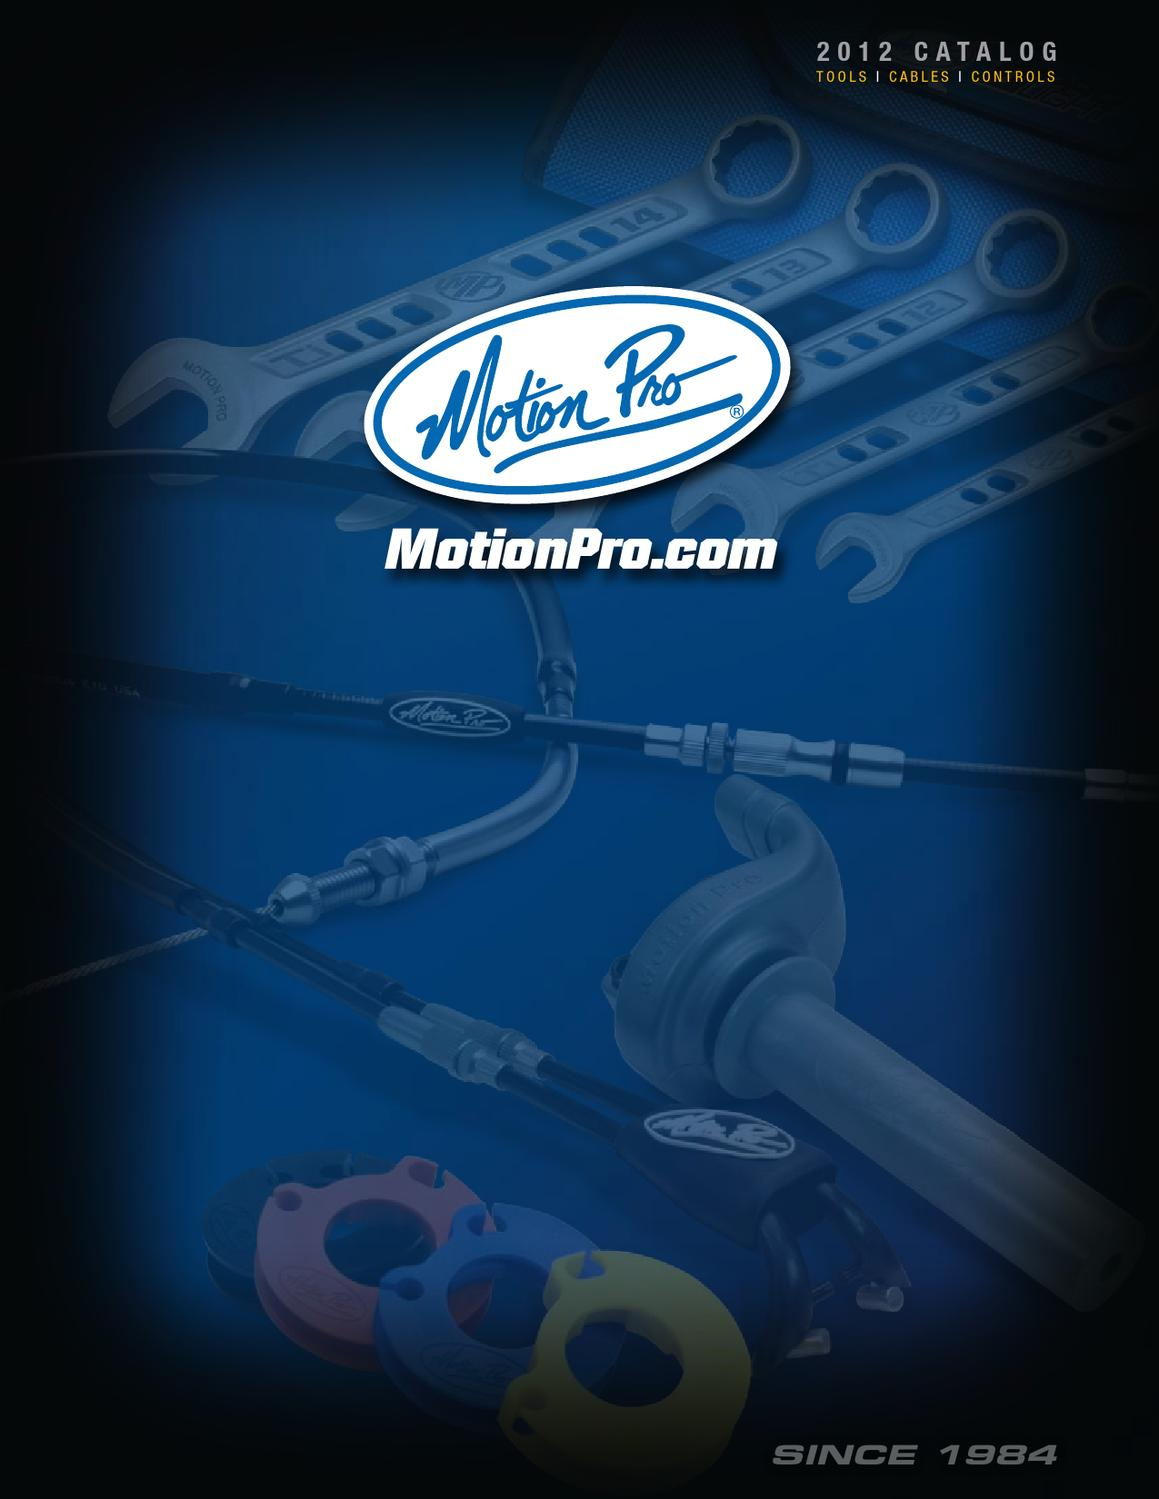 Motion Pro Throttle Cable Slip Barrel 6mm x 7mm // 10 Pack